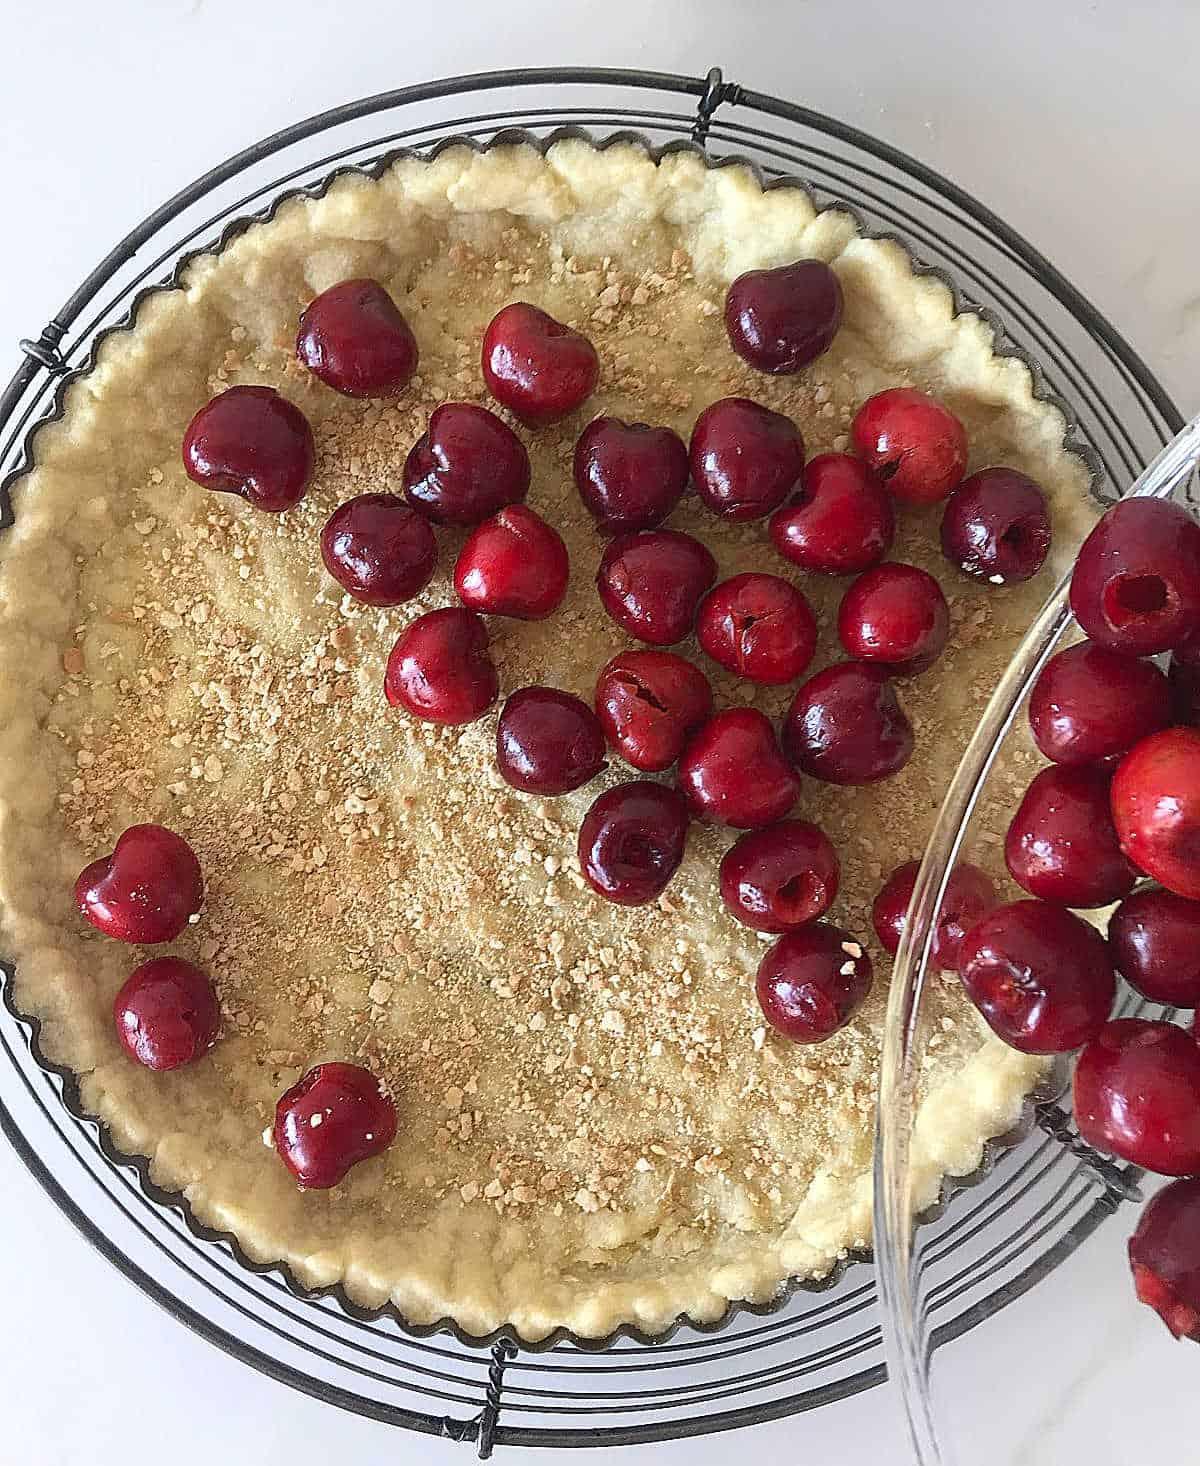 Filling tart crust with fresh cherries, white surface